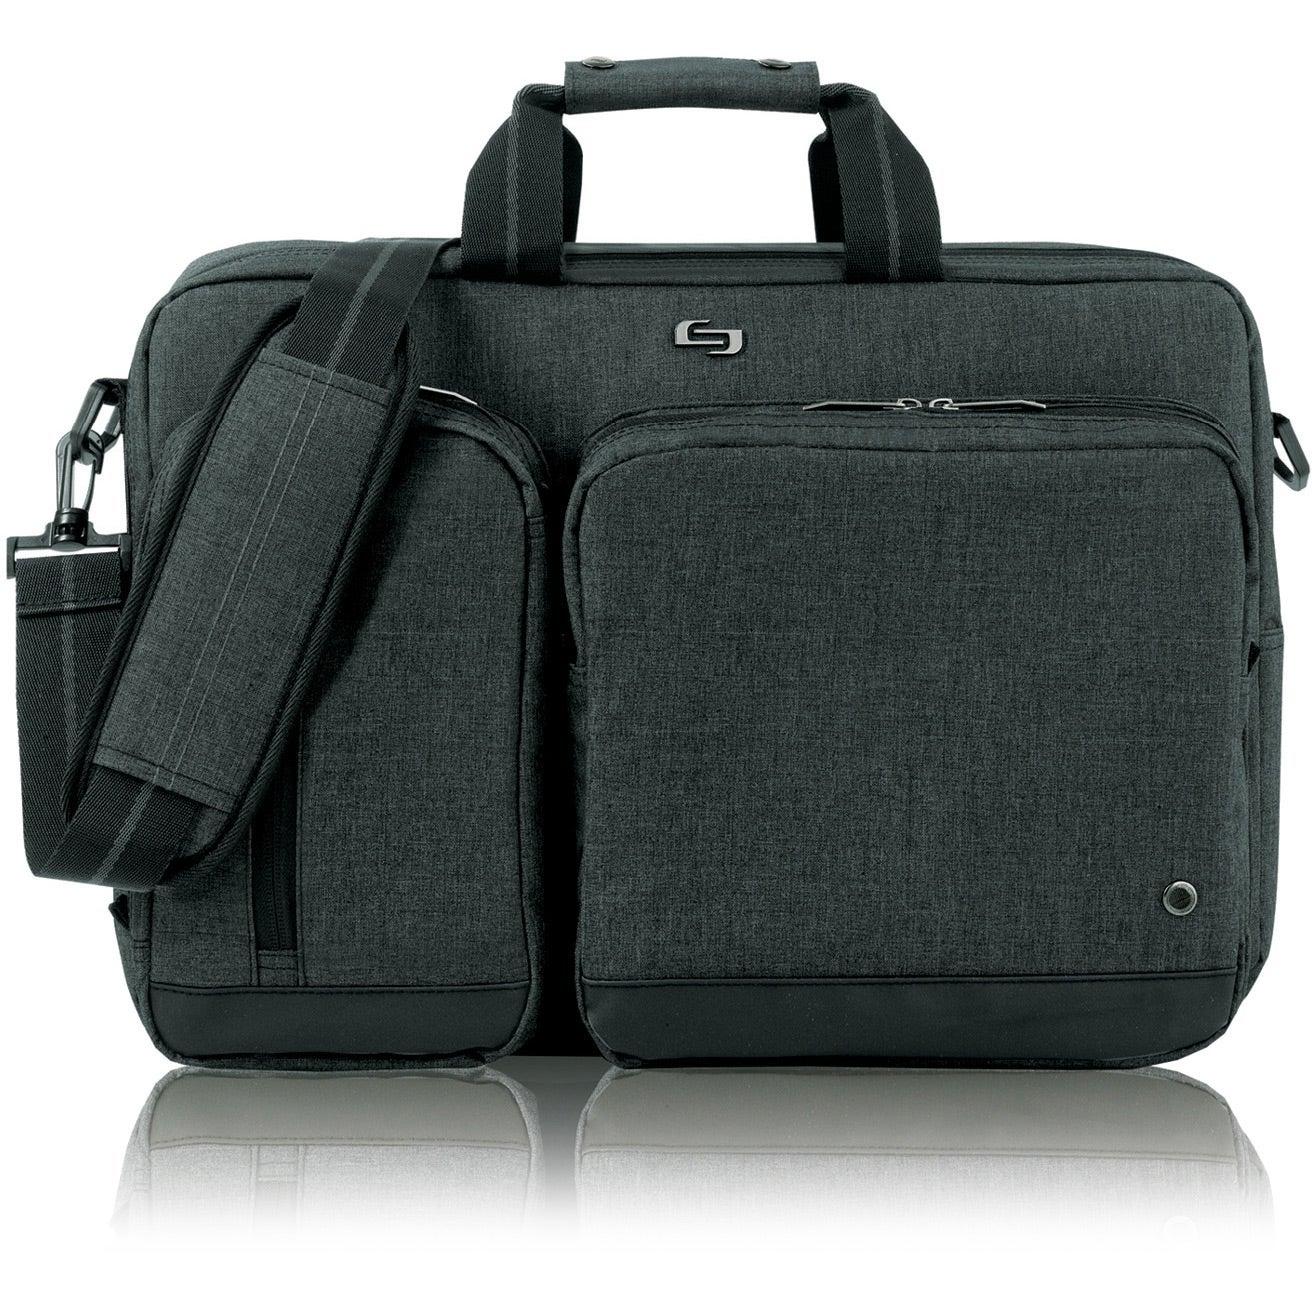 Gray Solo Urban Hybrid Briefcase For Advertising